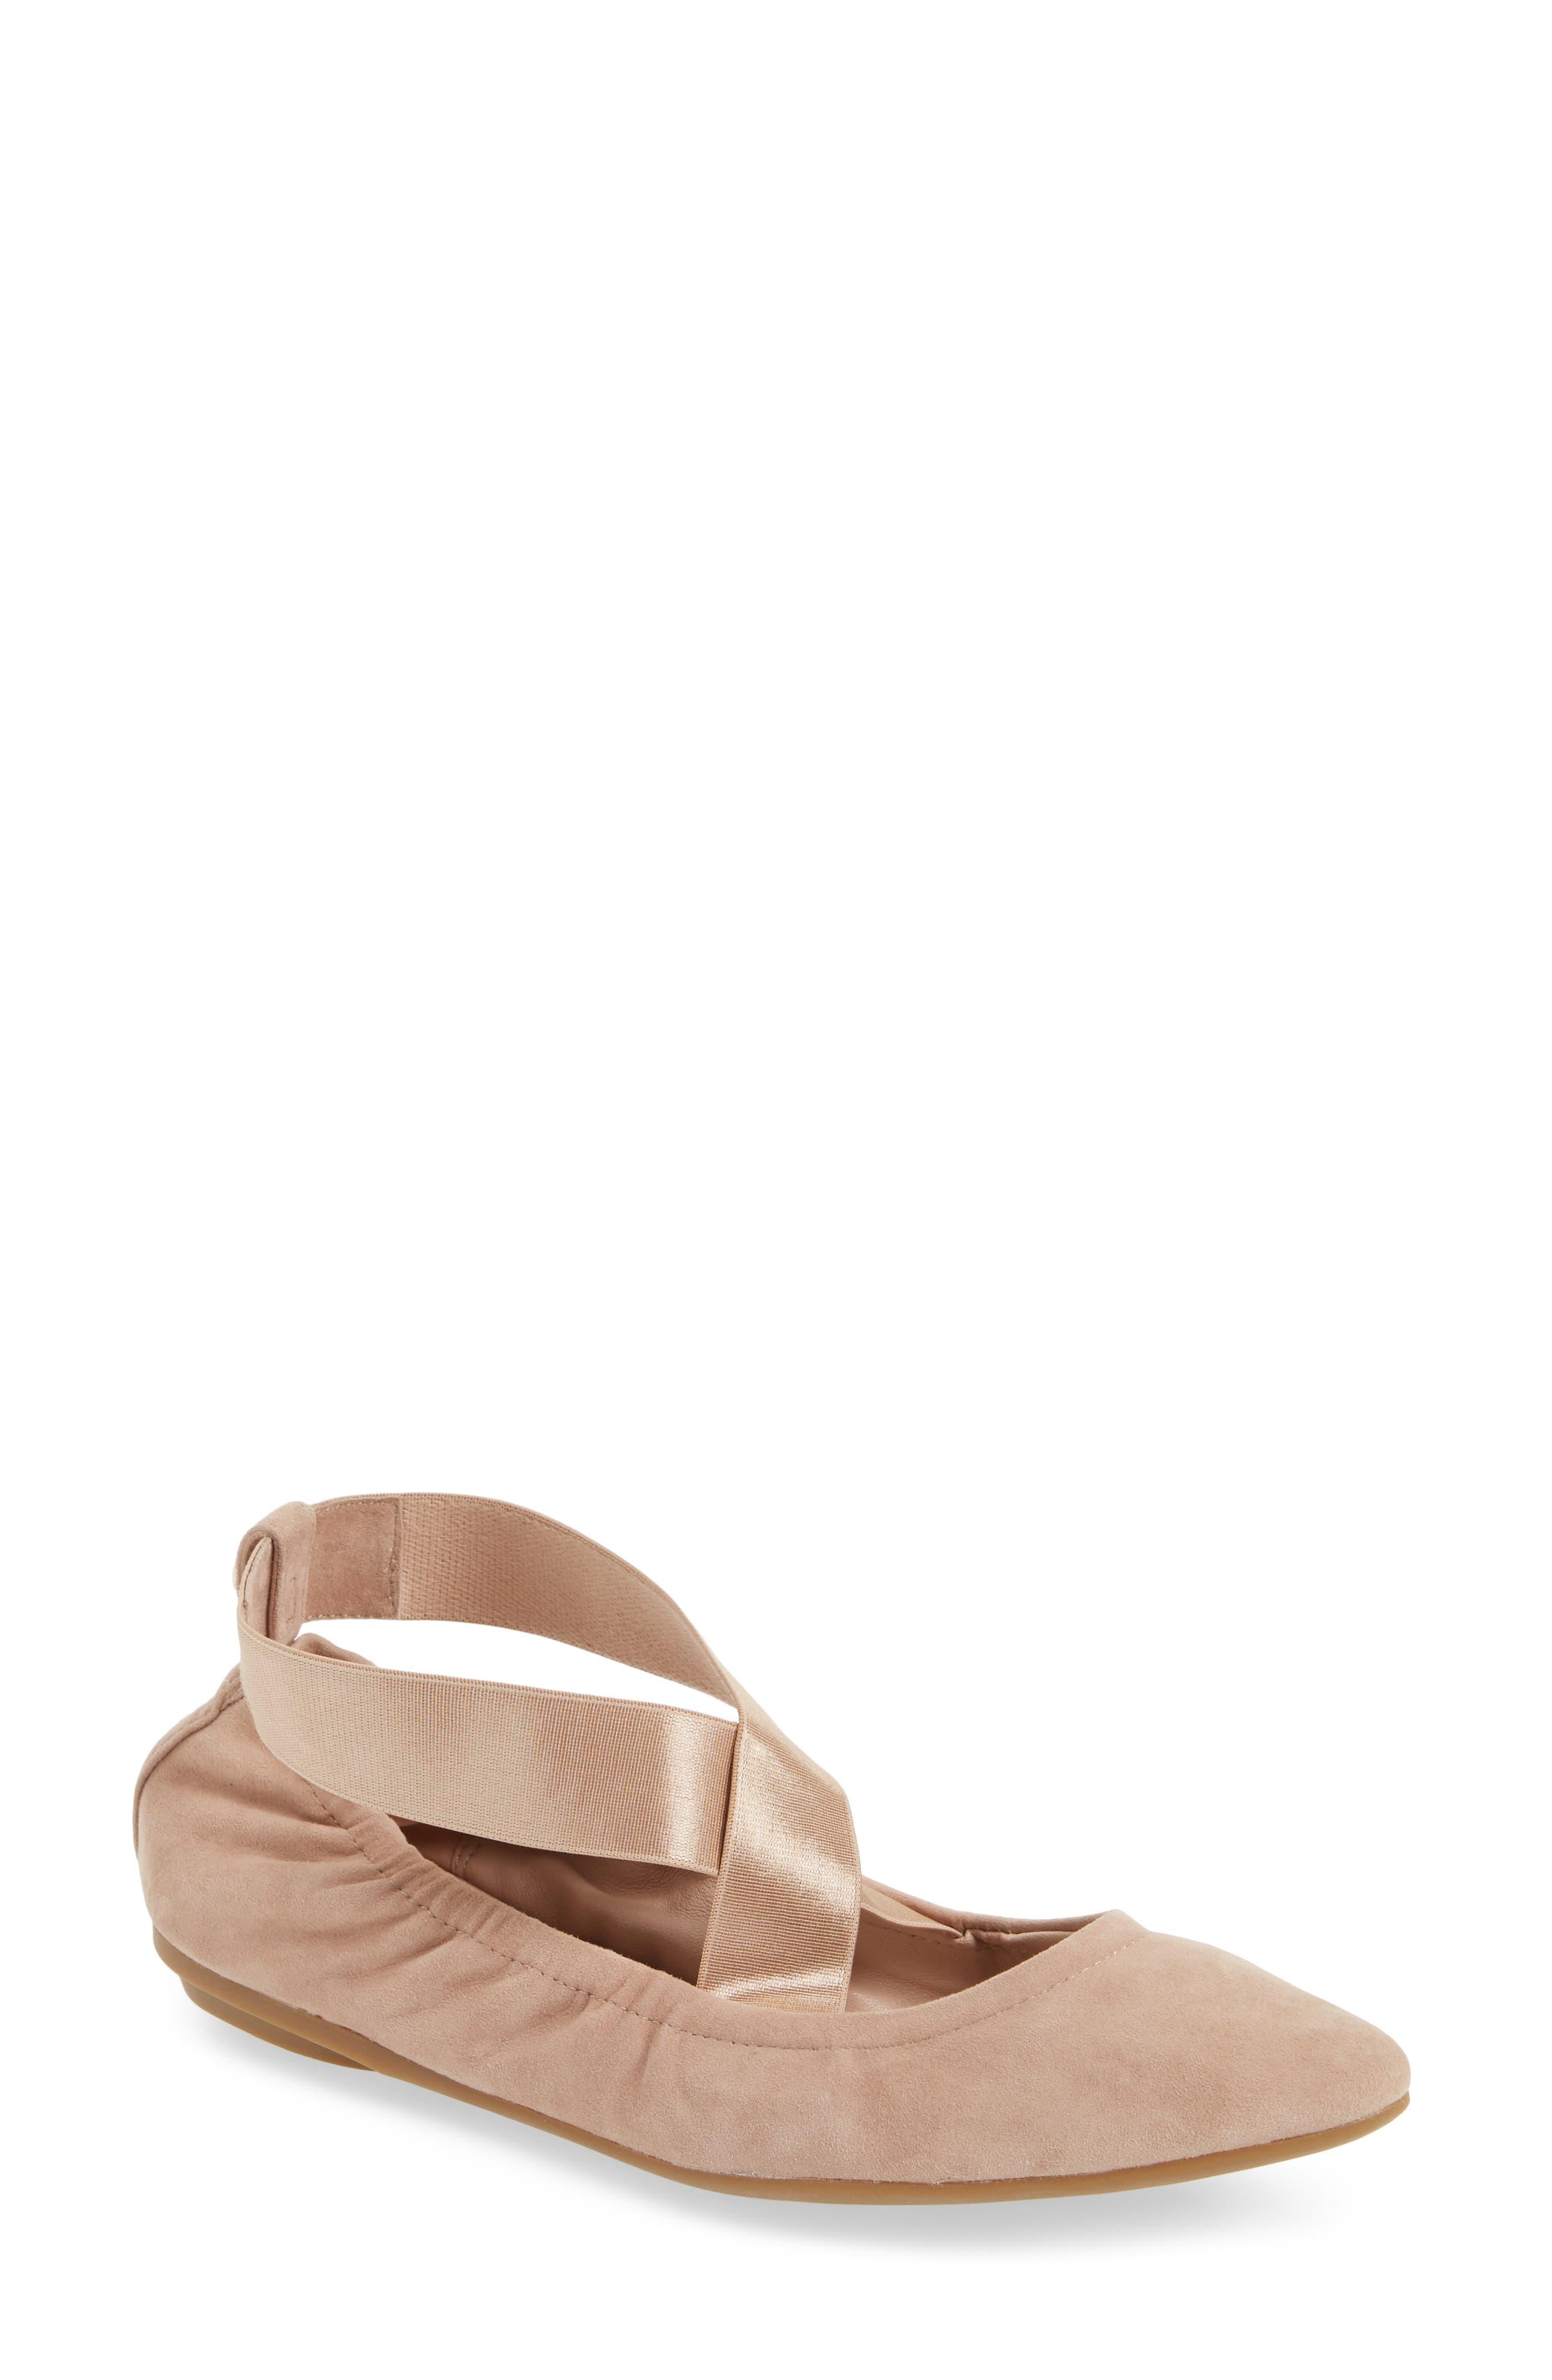 Edina Strappy Ballet Flat,                         Main,                         color, Soft Beige Suede